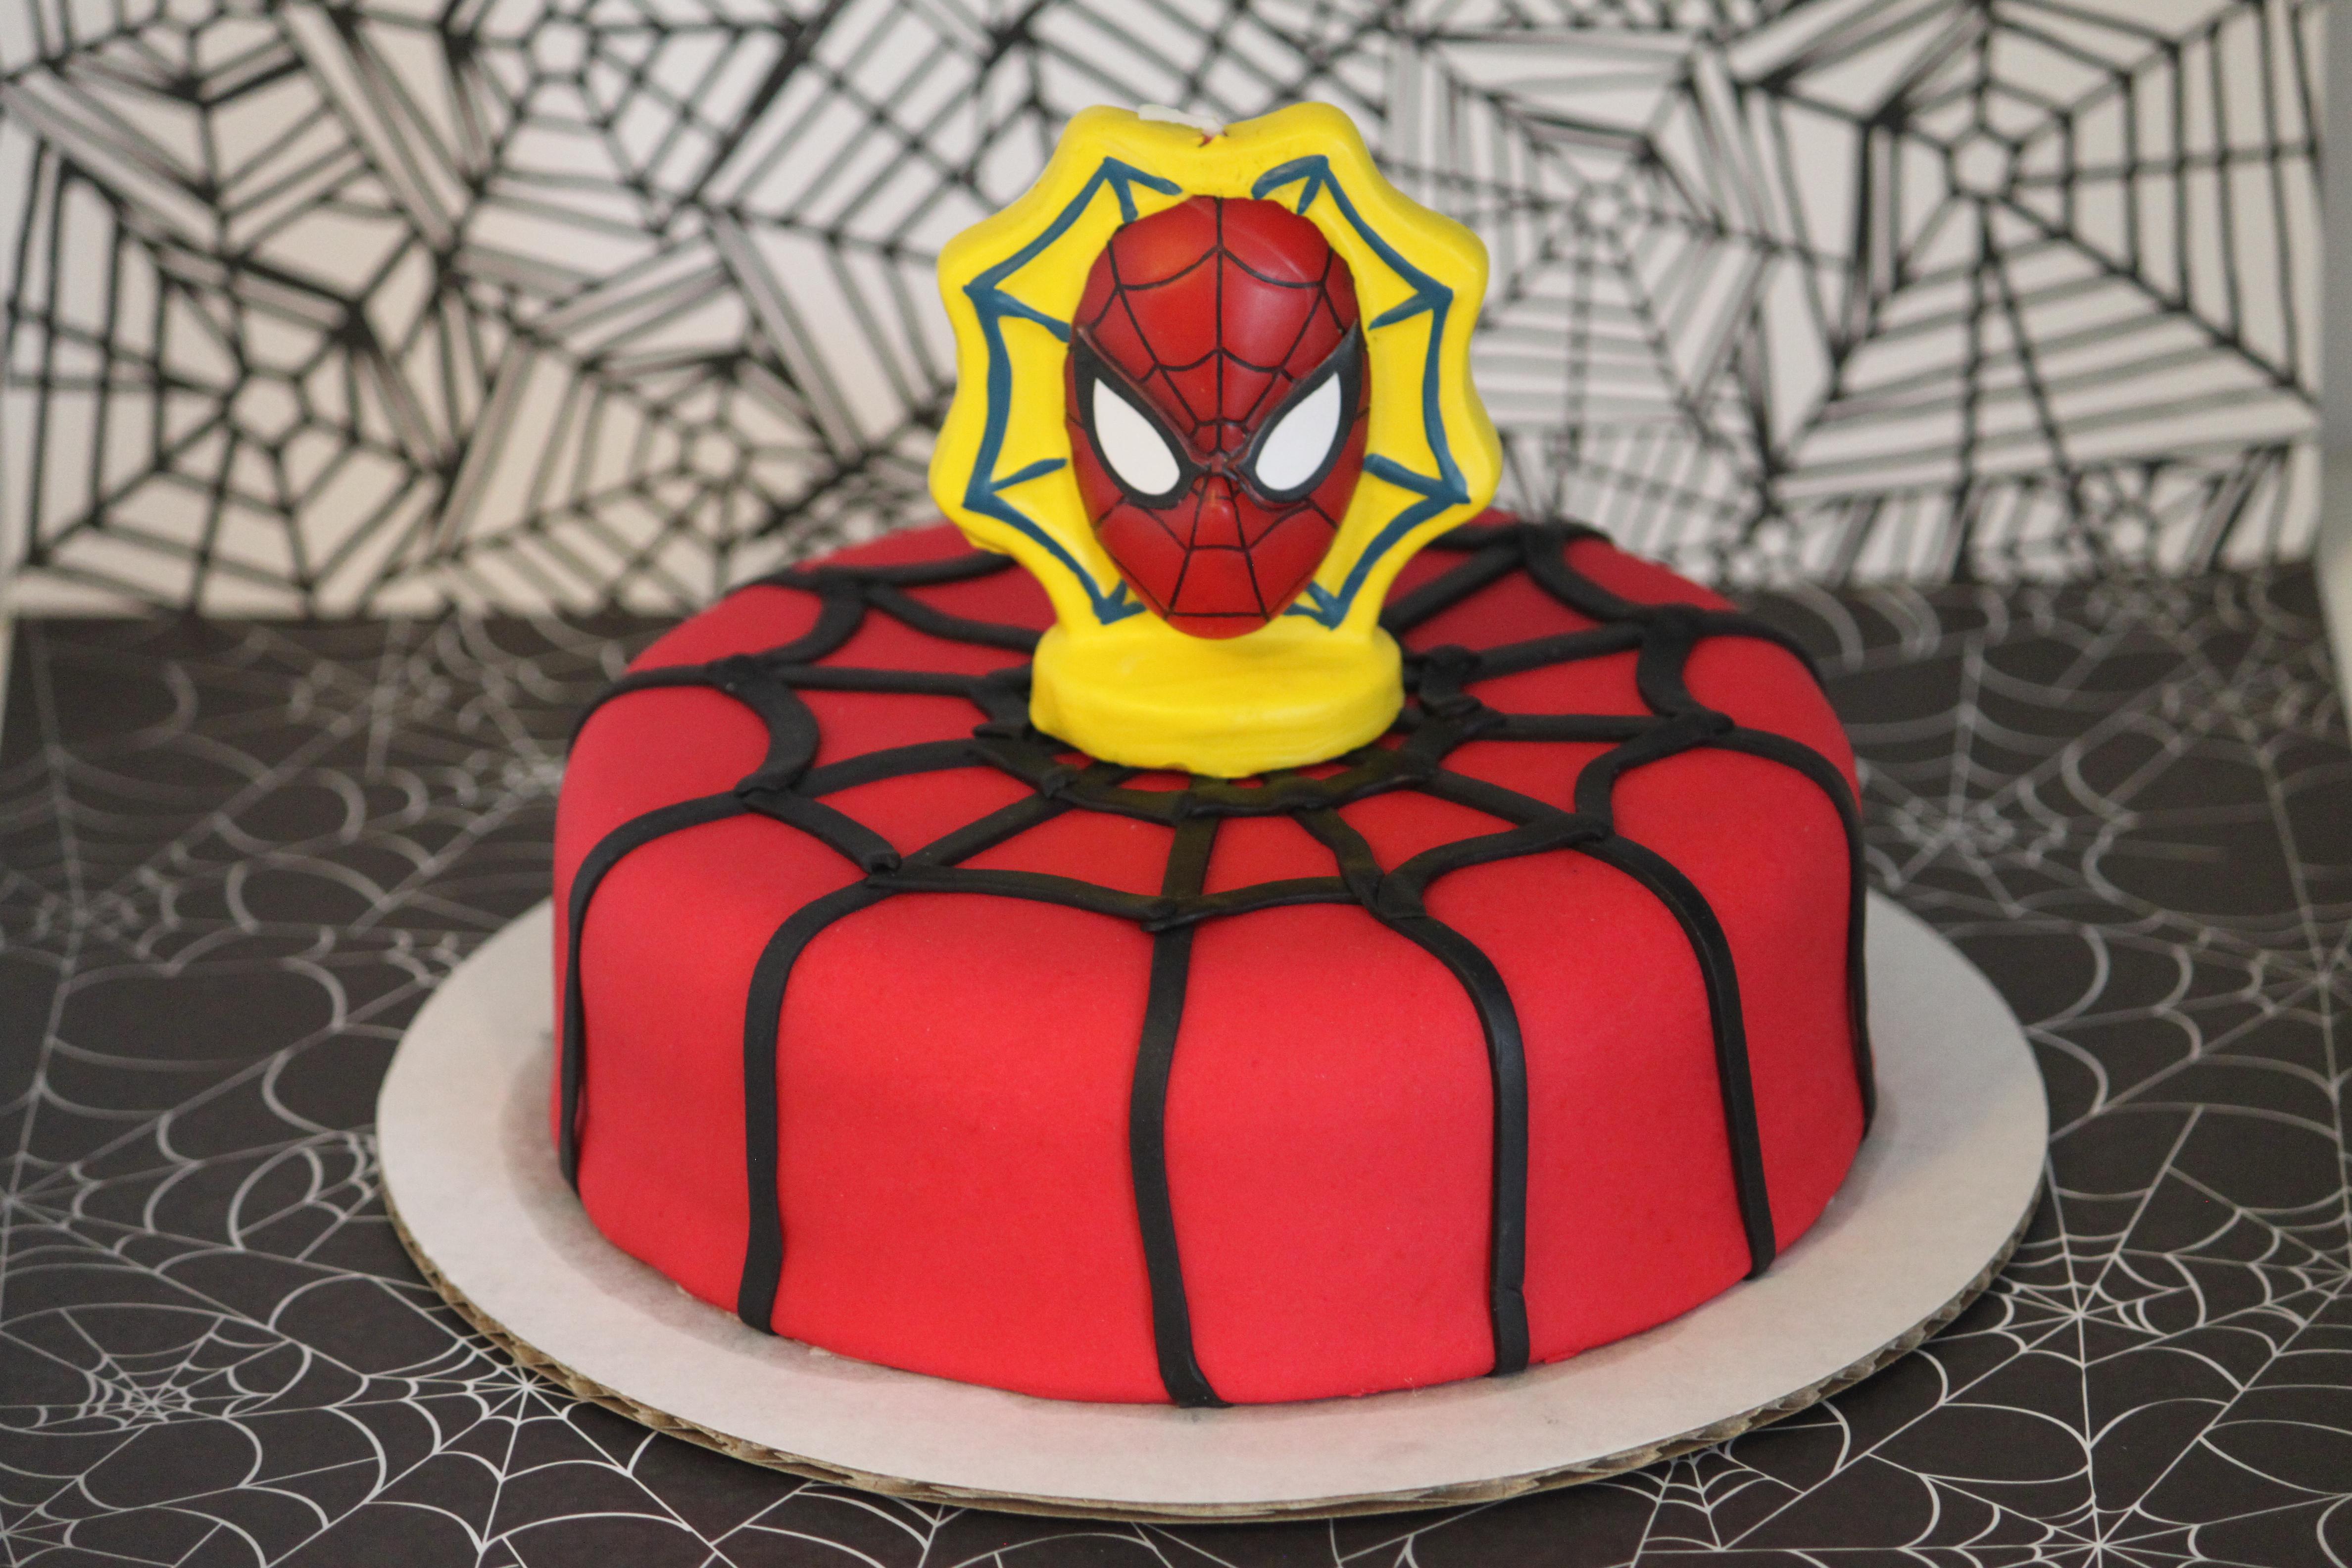 Sensational Mini Spider Man Fondant Birthday Cake Pennys Food Blog Funny Birthday Cards Online Barepcheapnameinfo